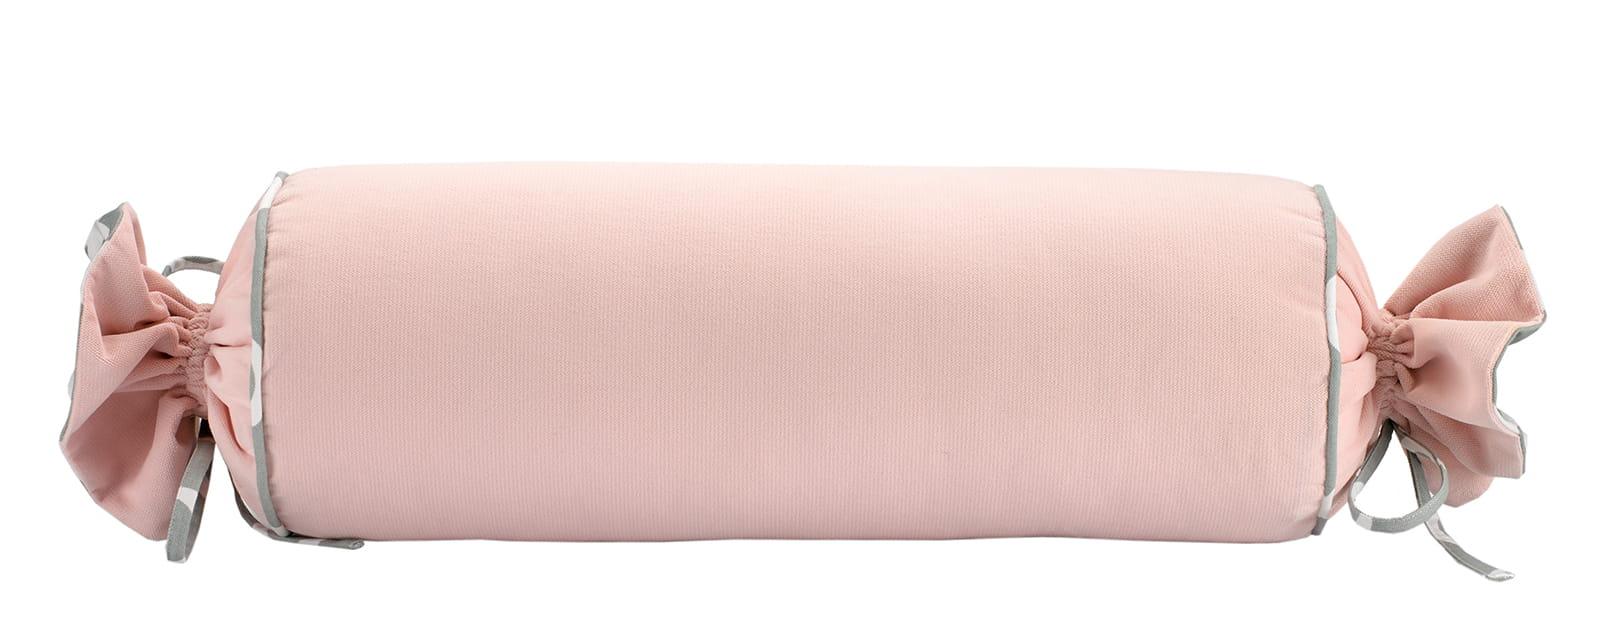 Poduszka dekoracyjna Rose Quartz Candy 20x58 cm - We Love Candles&We Love Beds